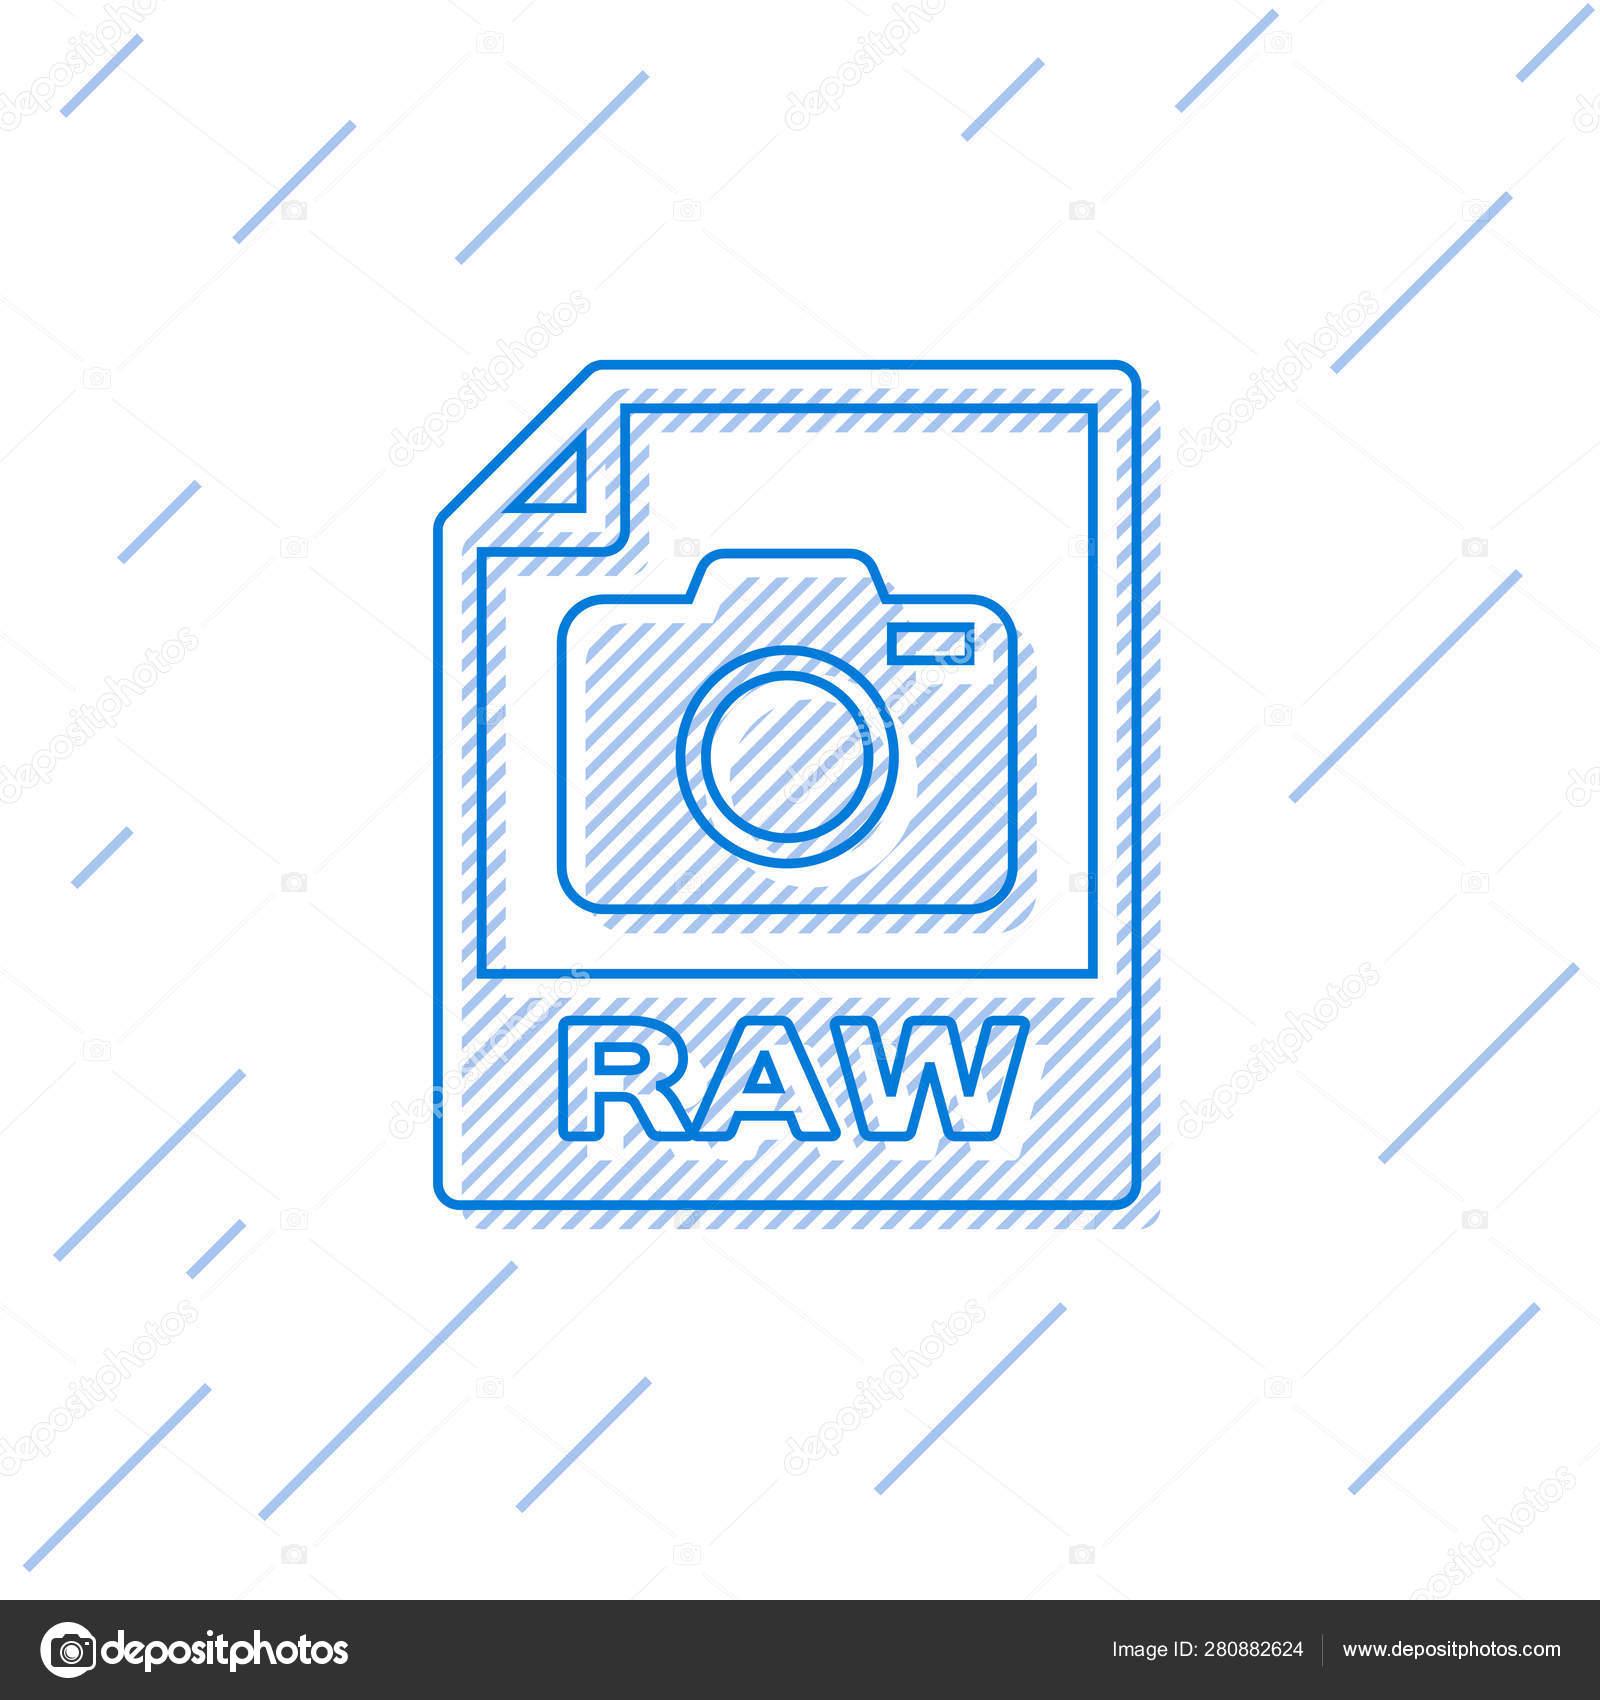 Blue RAW file document icon  Download raw button line icon